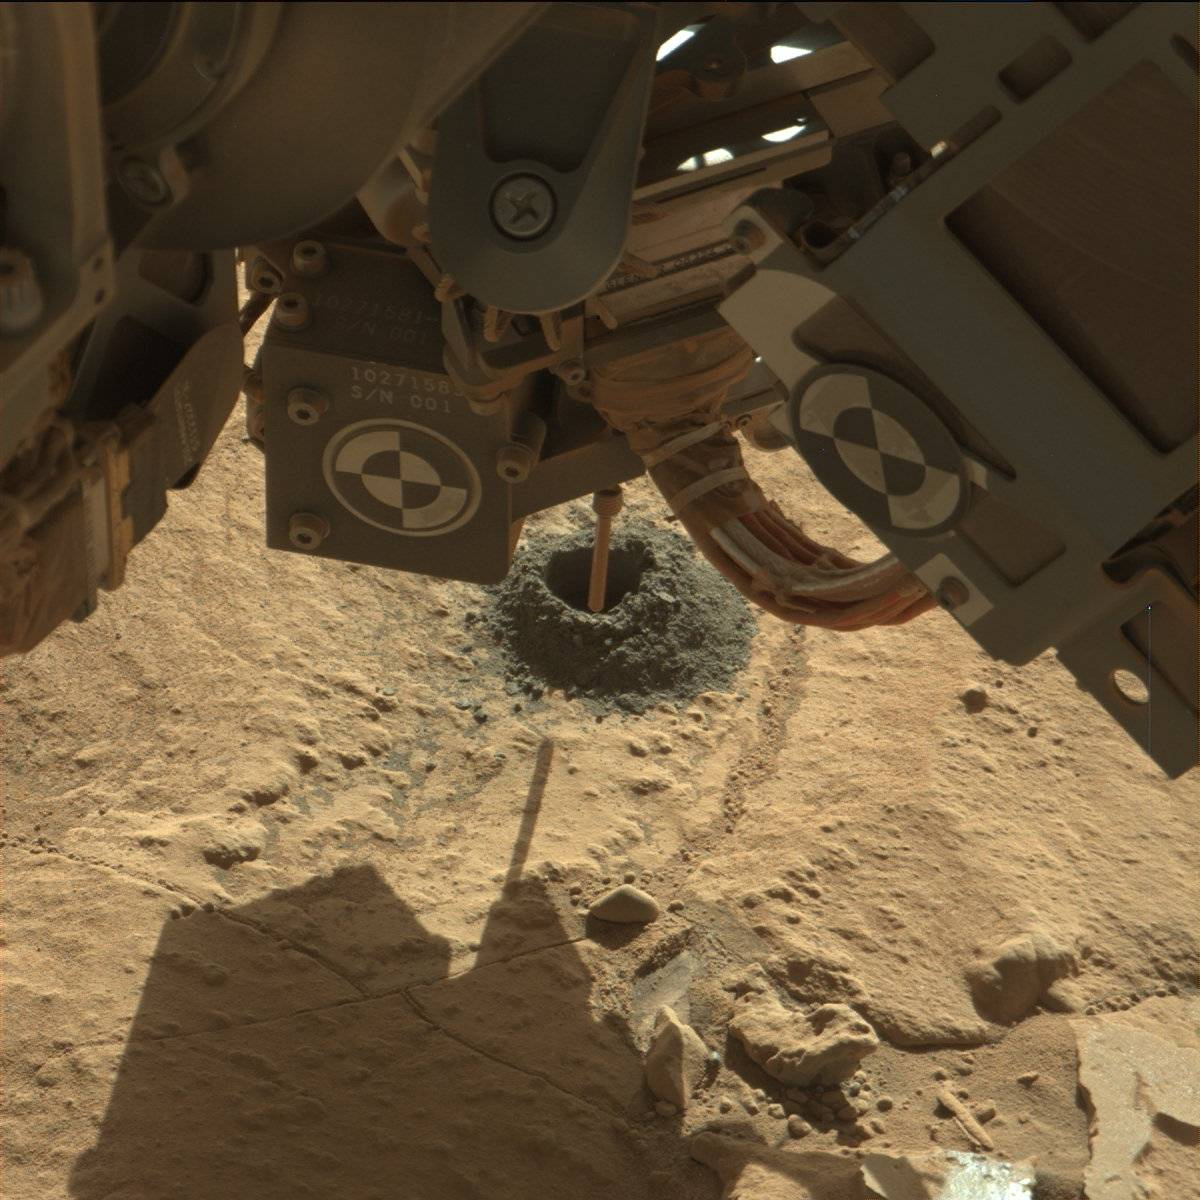 mars rover drill - photo #5